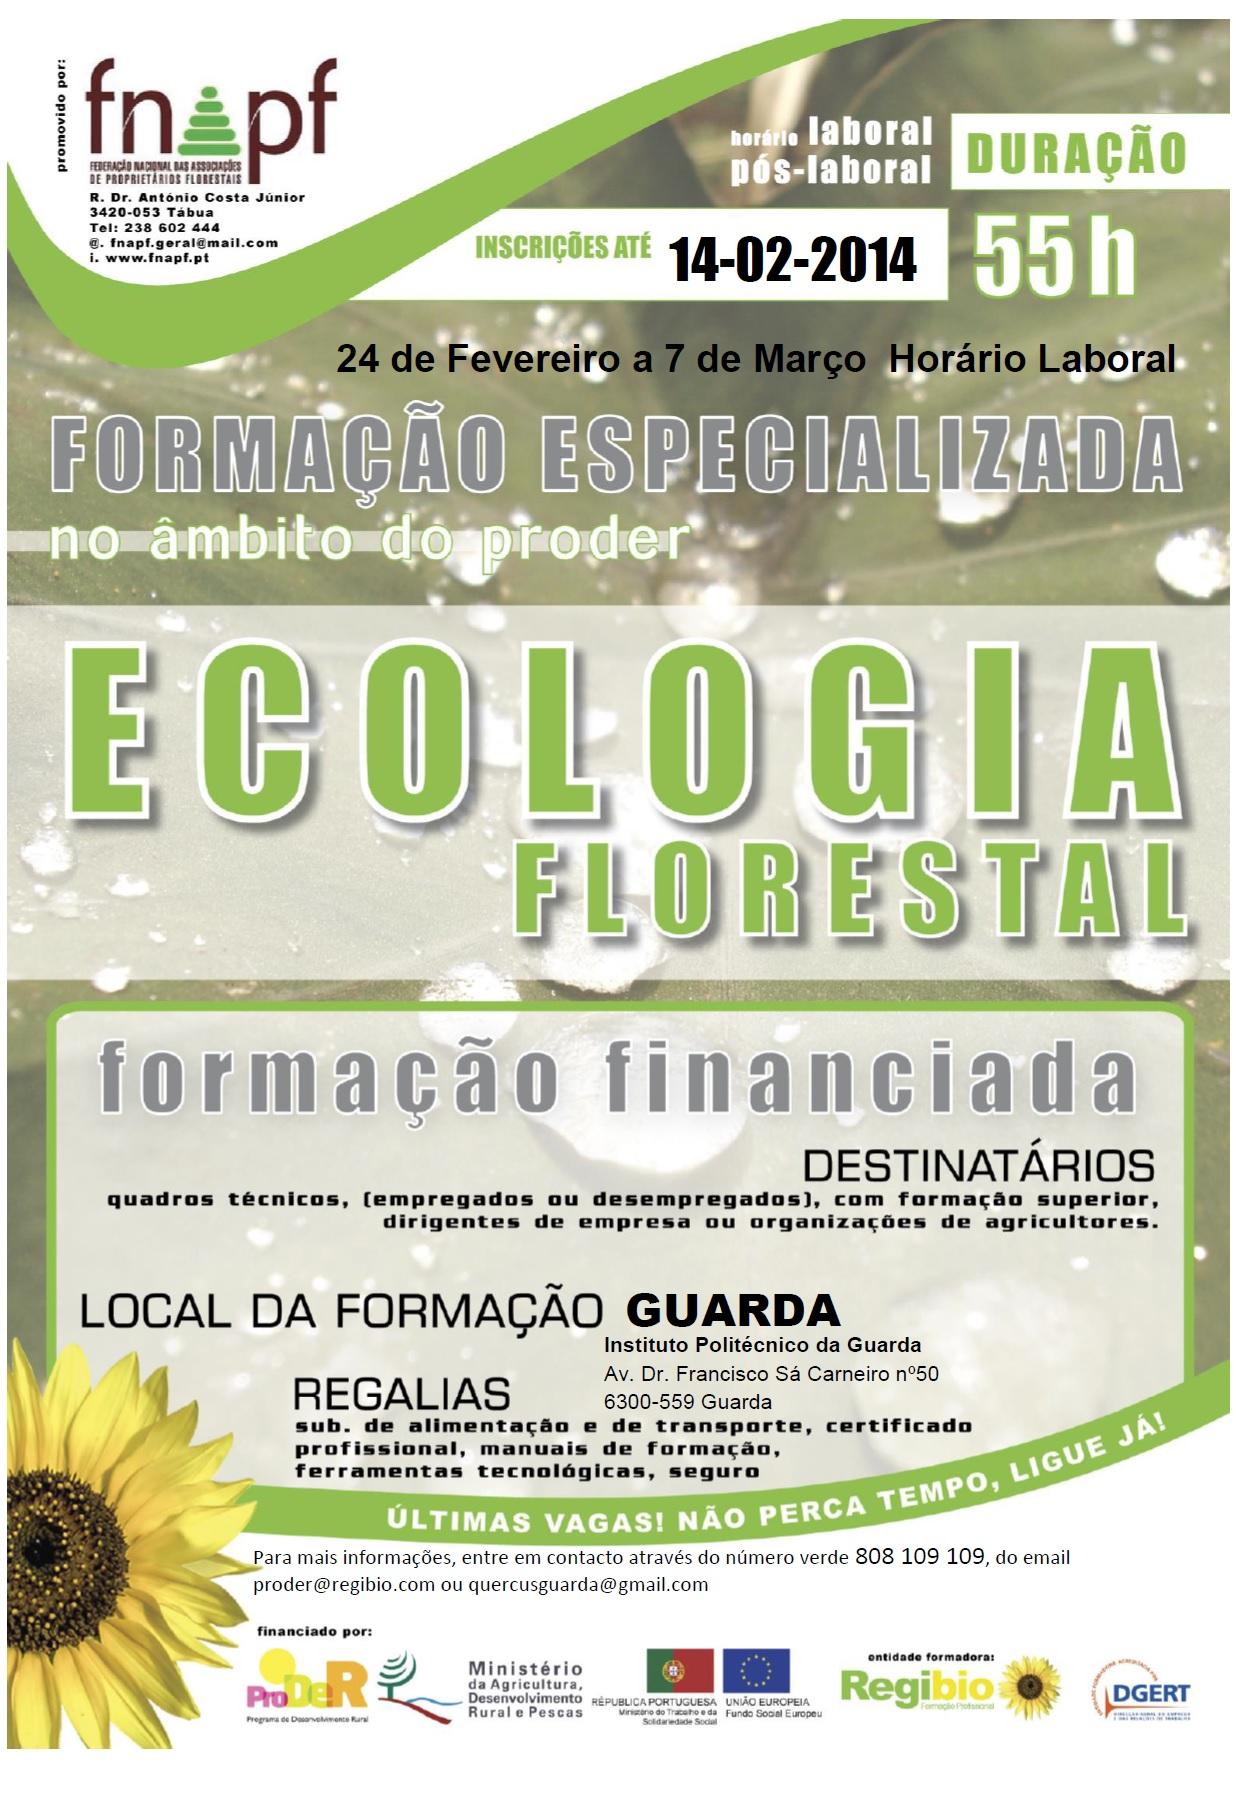 fnapf - ecologia florestal A4